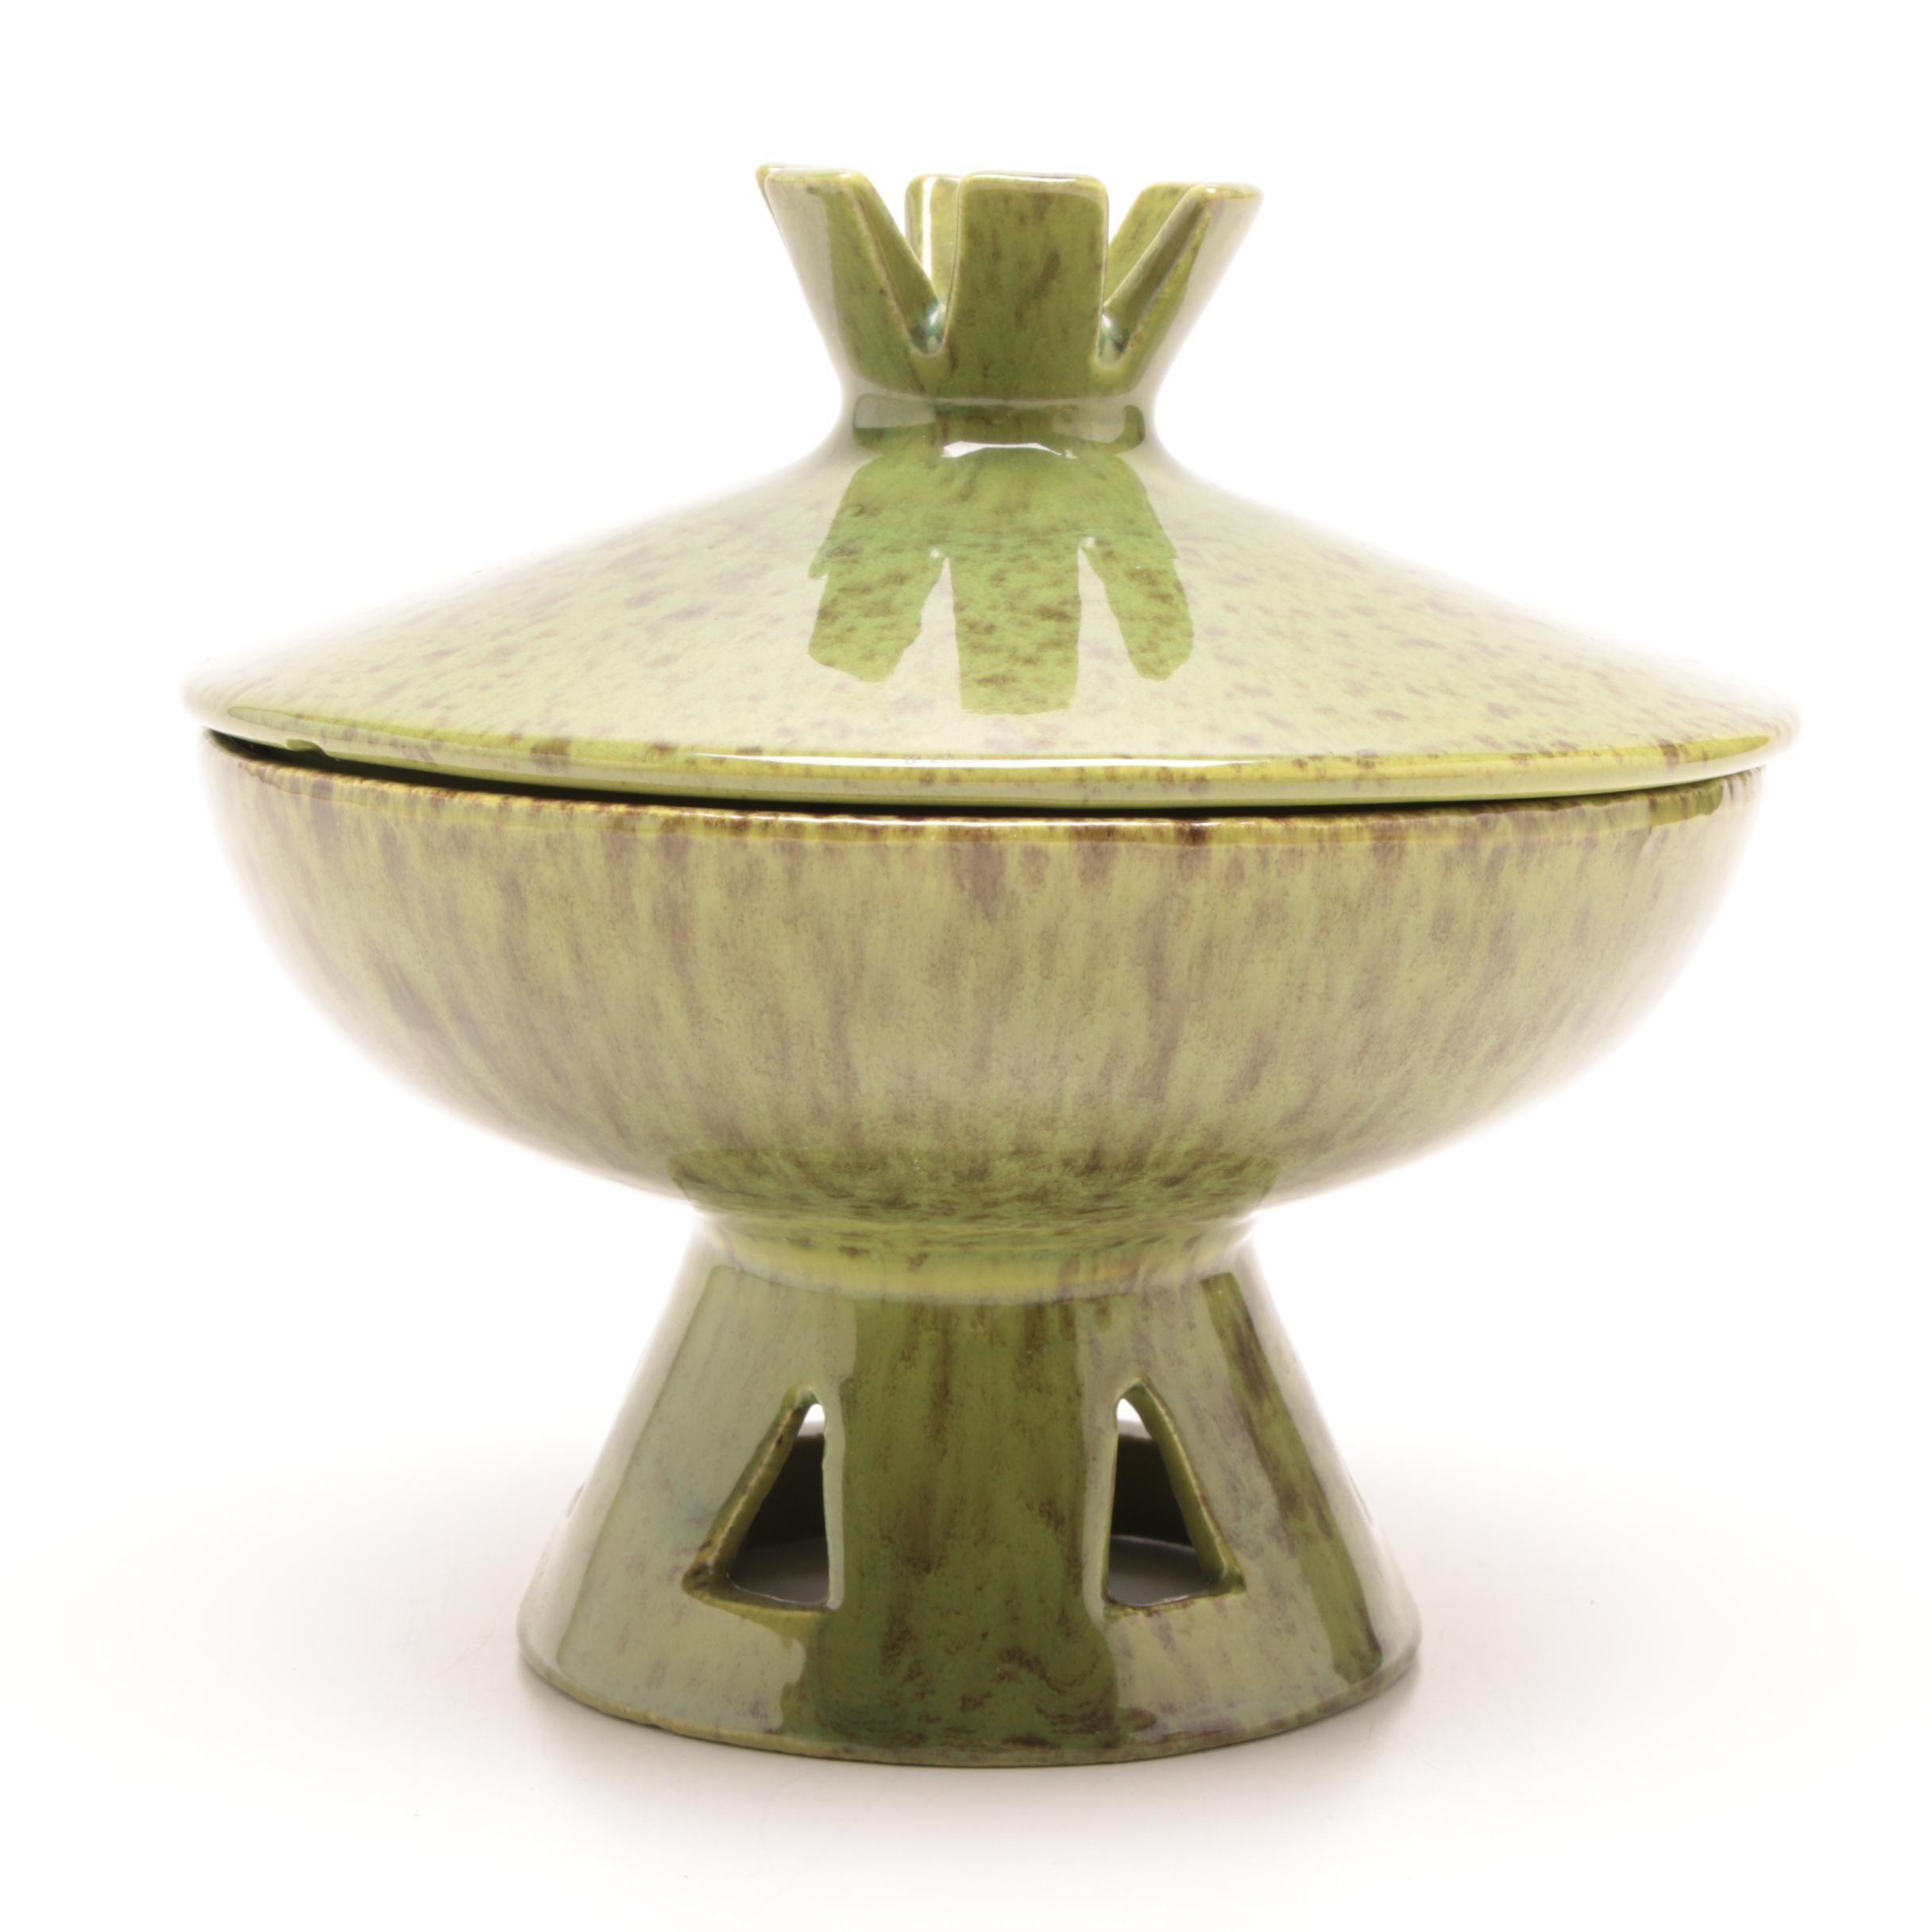 Haeger Pottery Green Lidded Pedestal Bowl